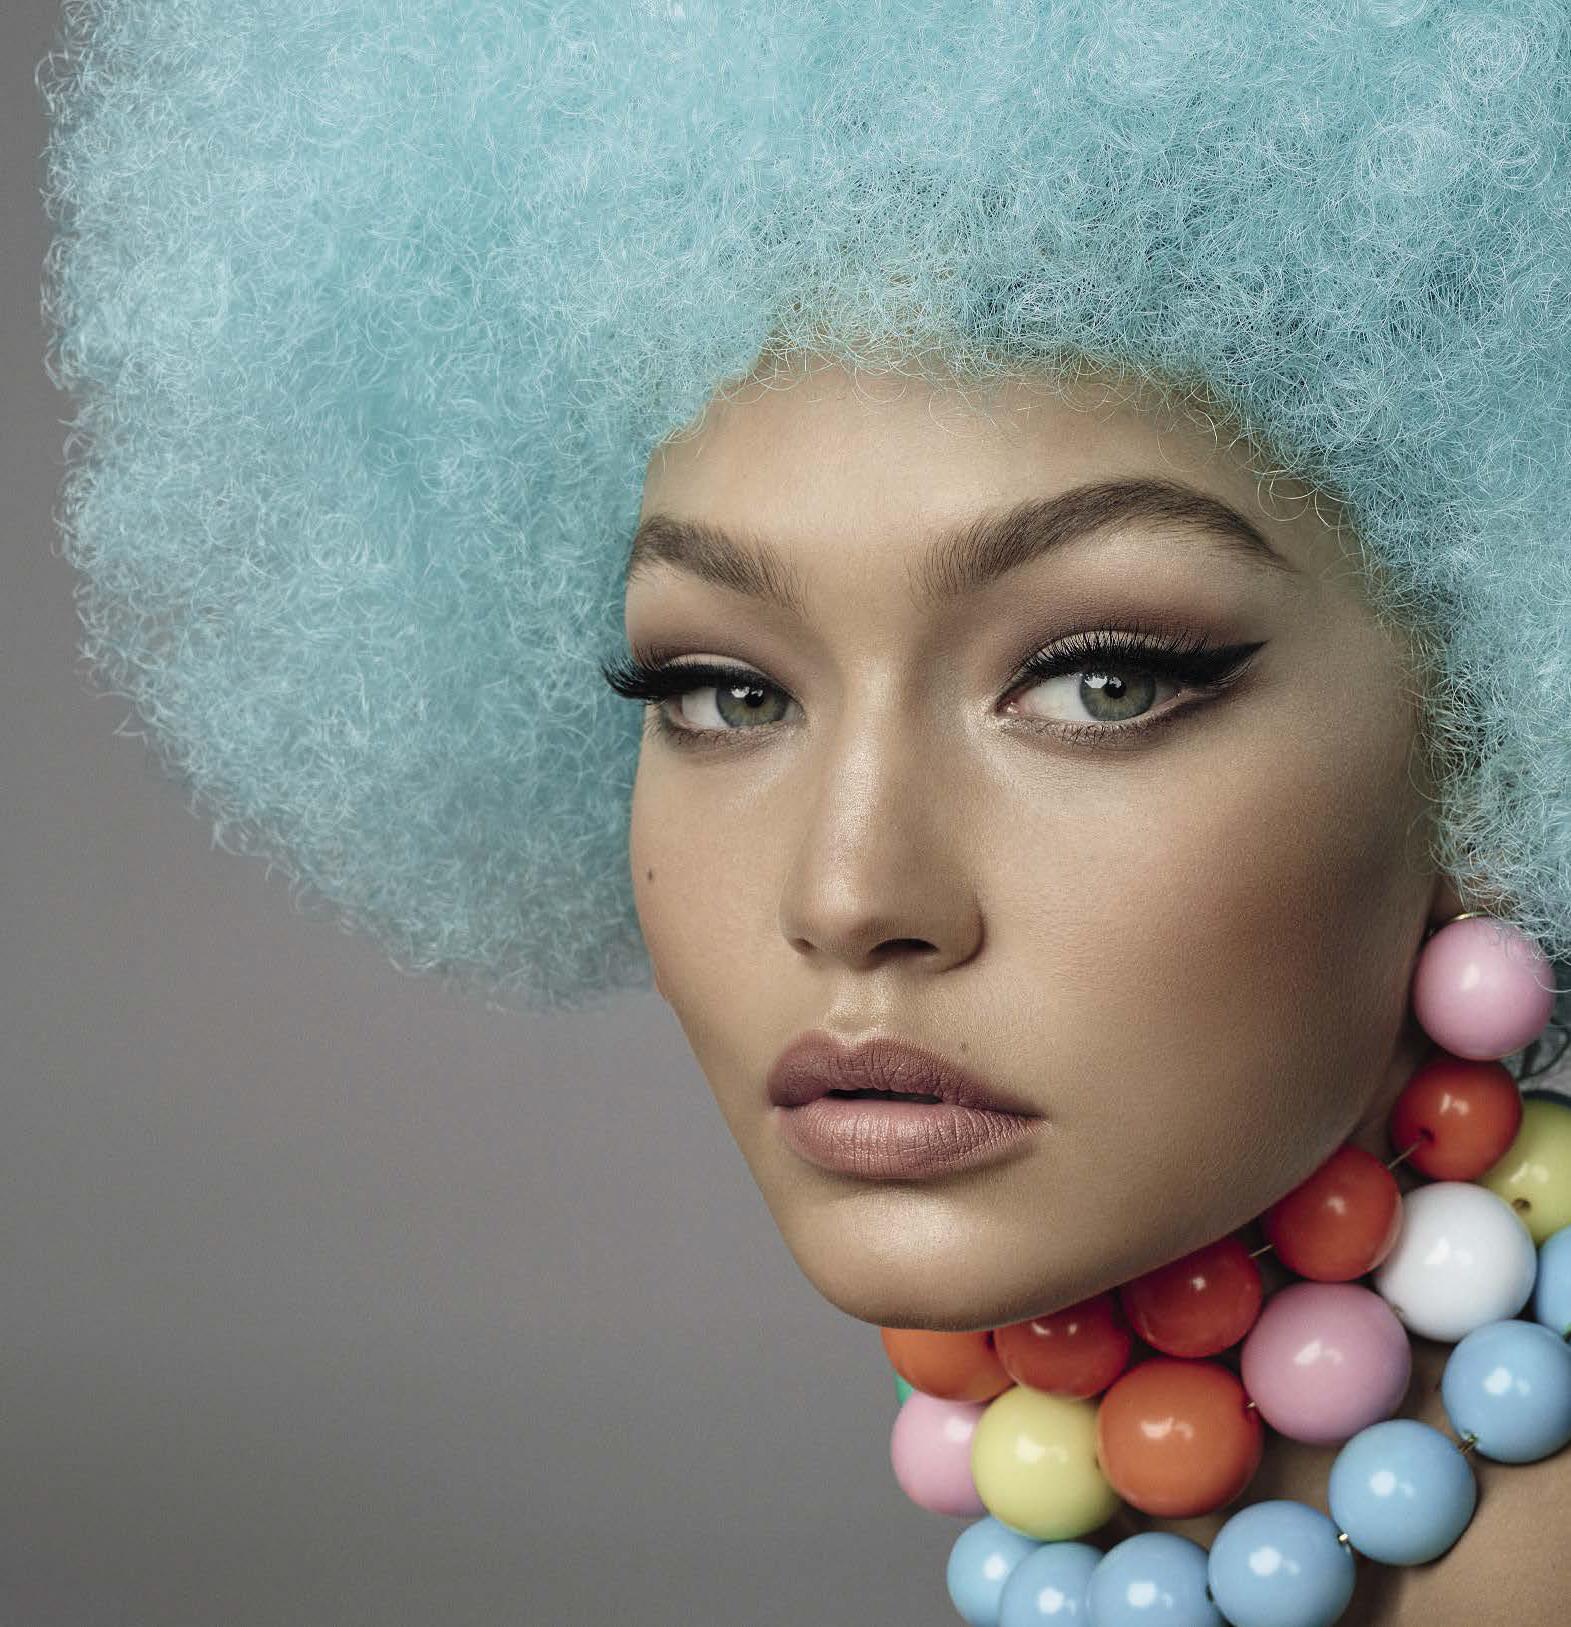 Gigi Hadid by Steven Meisel for Vogue Italia, November 2015 / Make-up: Pat McGrath